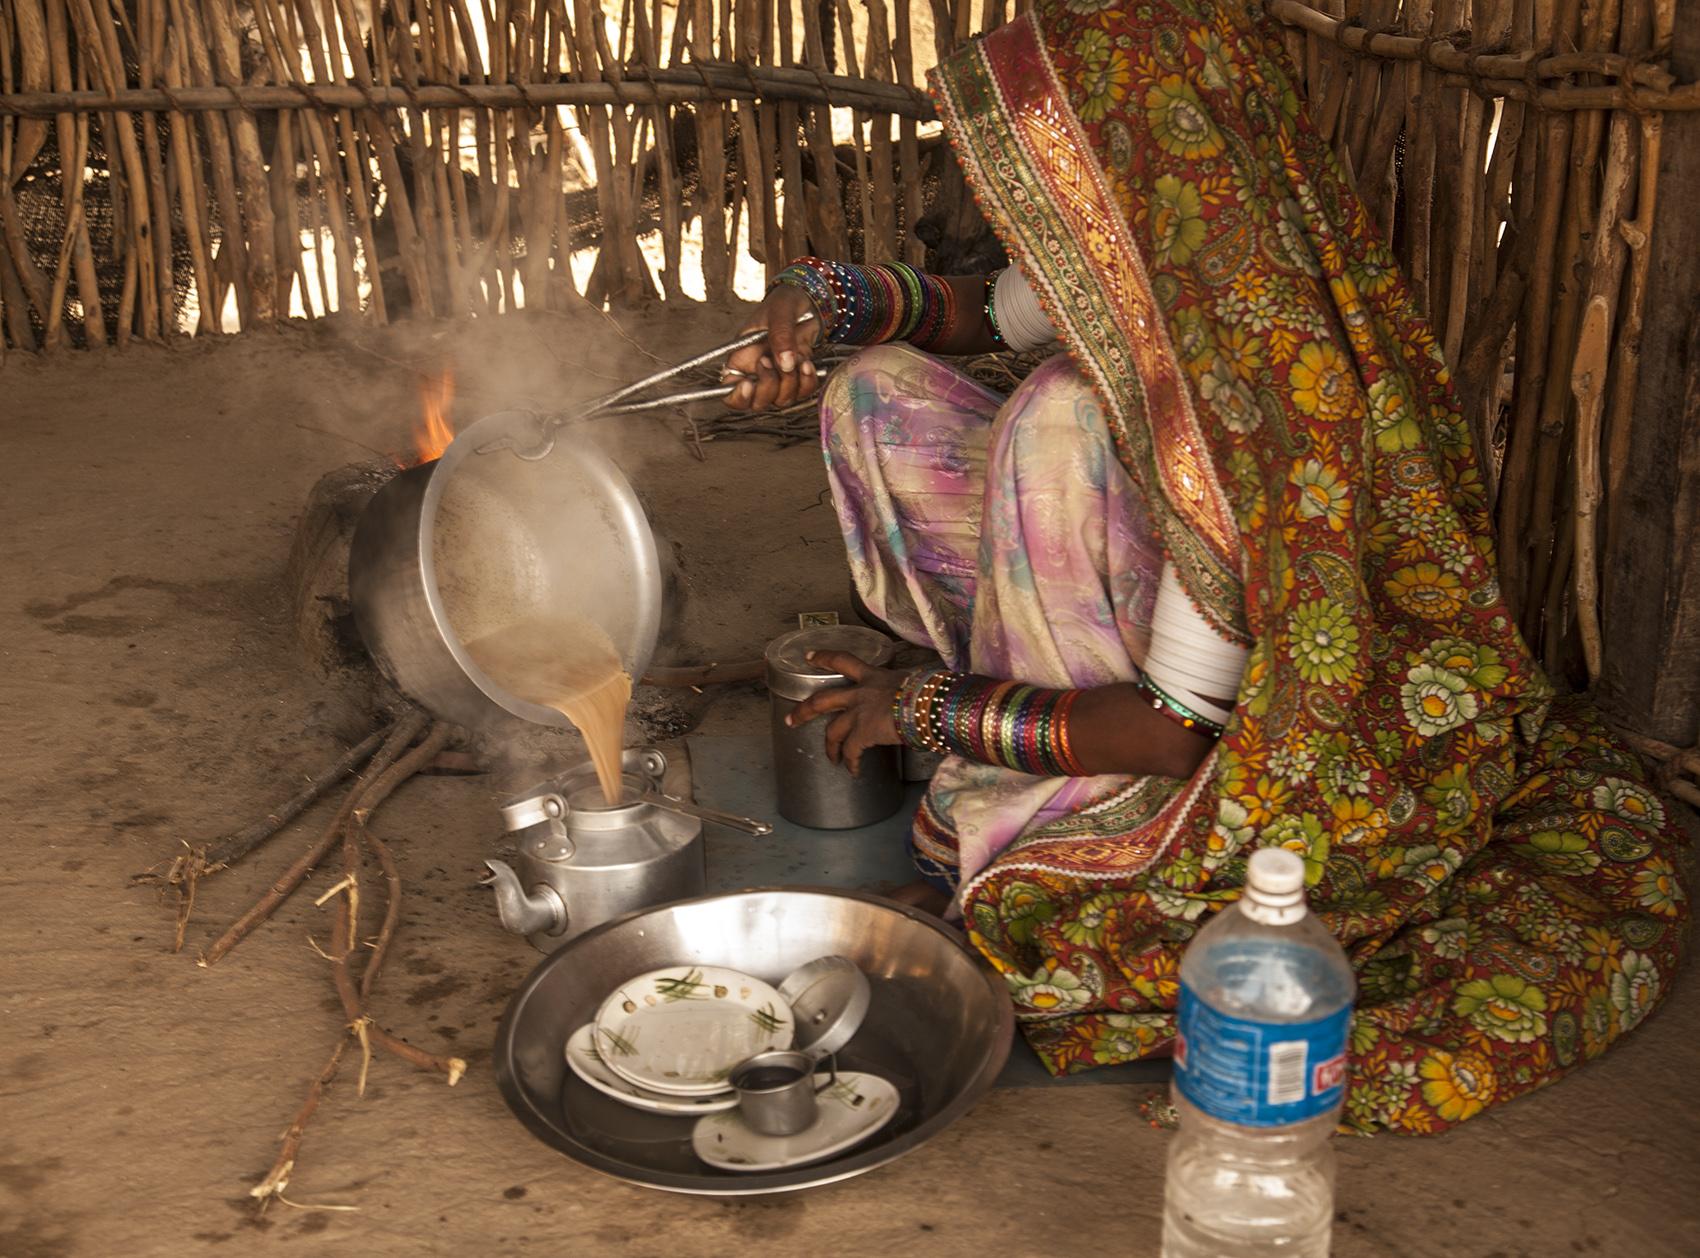 Making tea, Gujarat, India